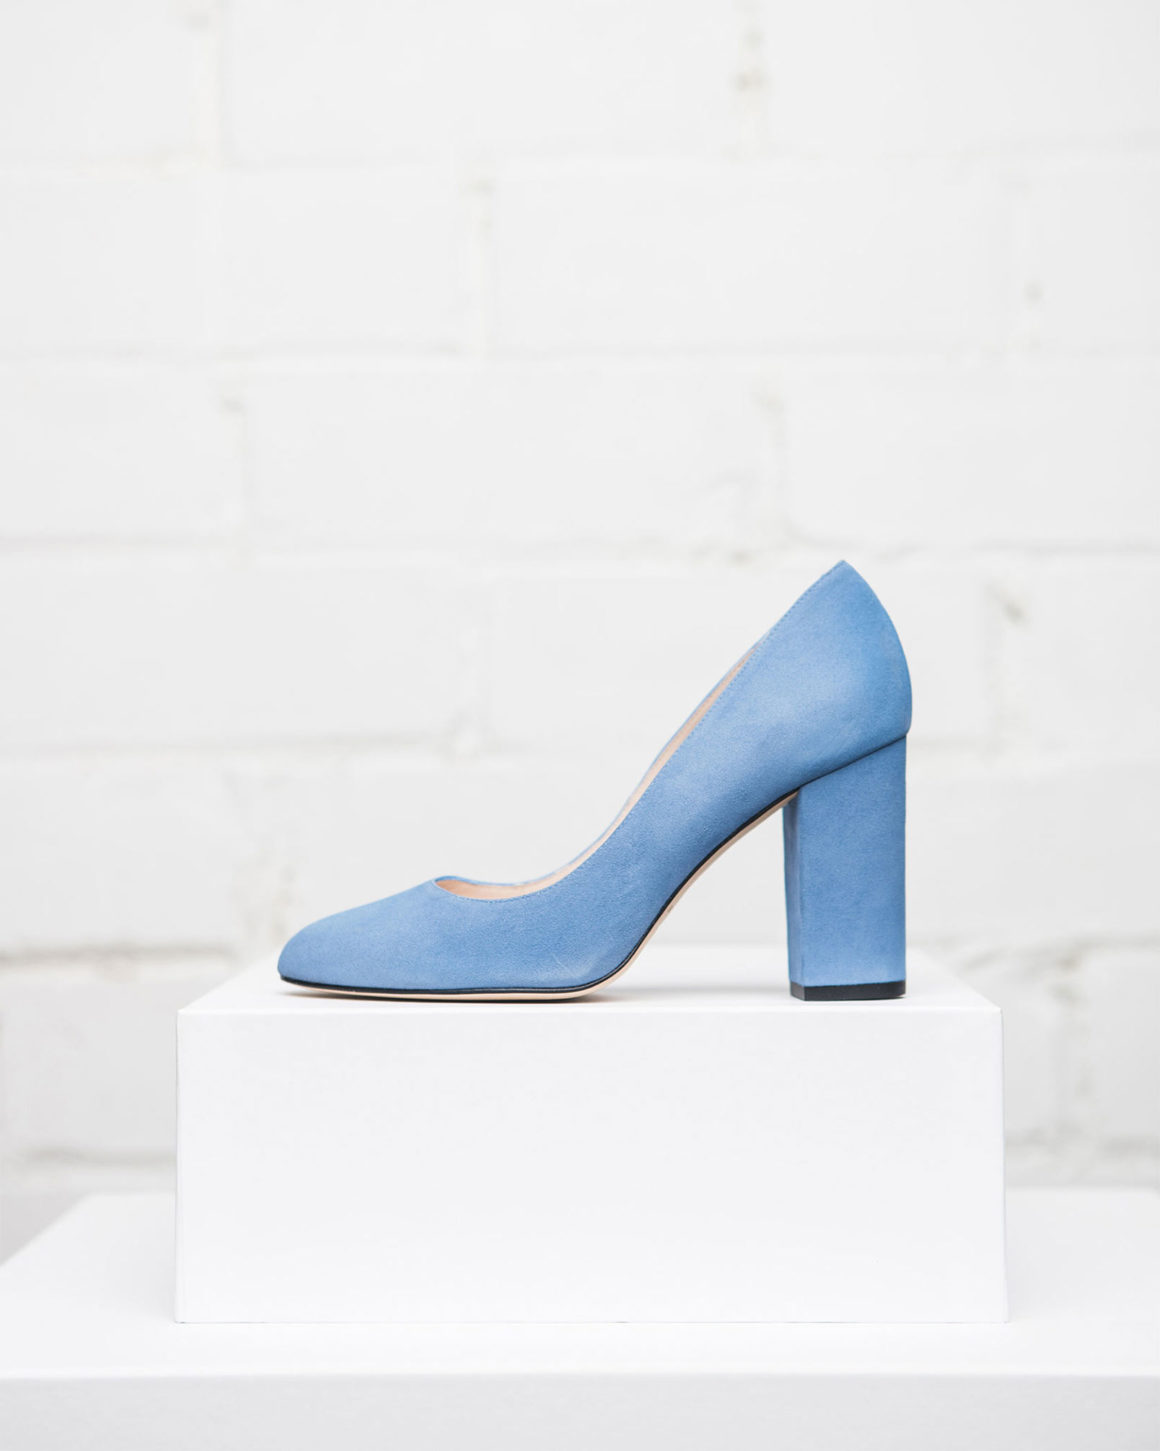 zapatos de mujer Maria Albertin. Zapatos de tacón mujer onlilne.